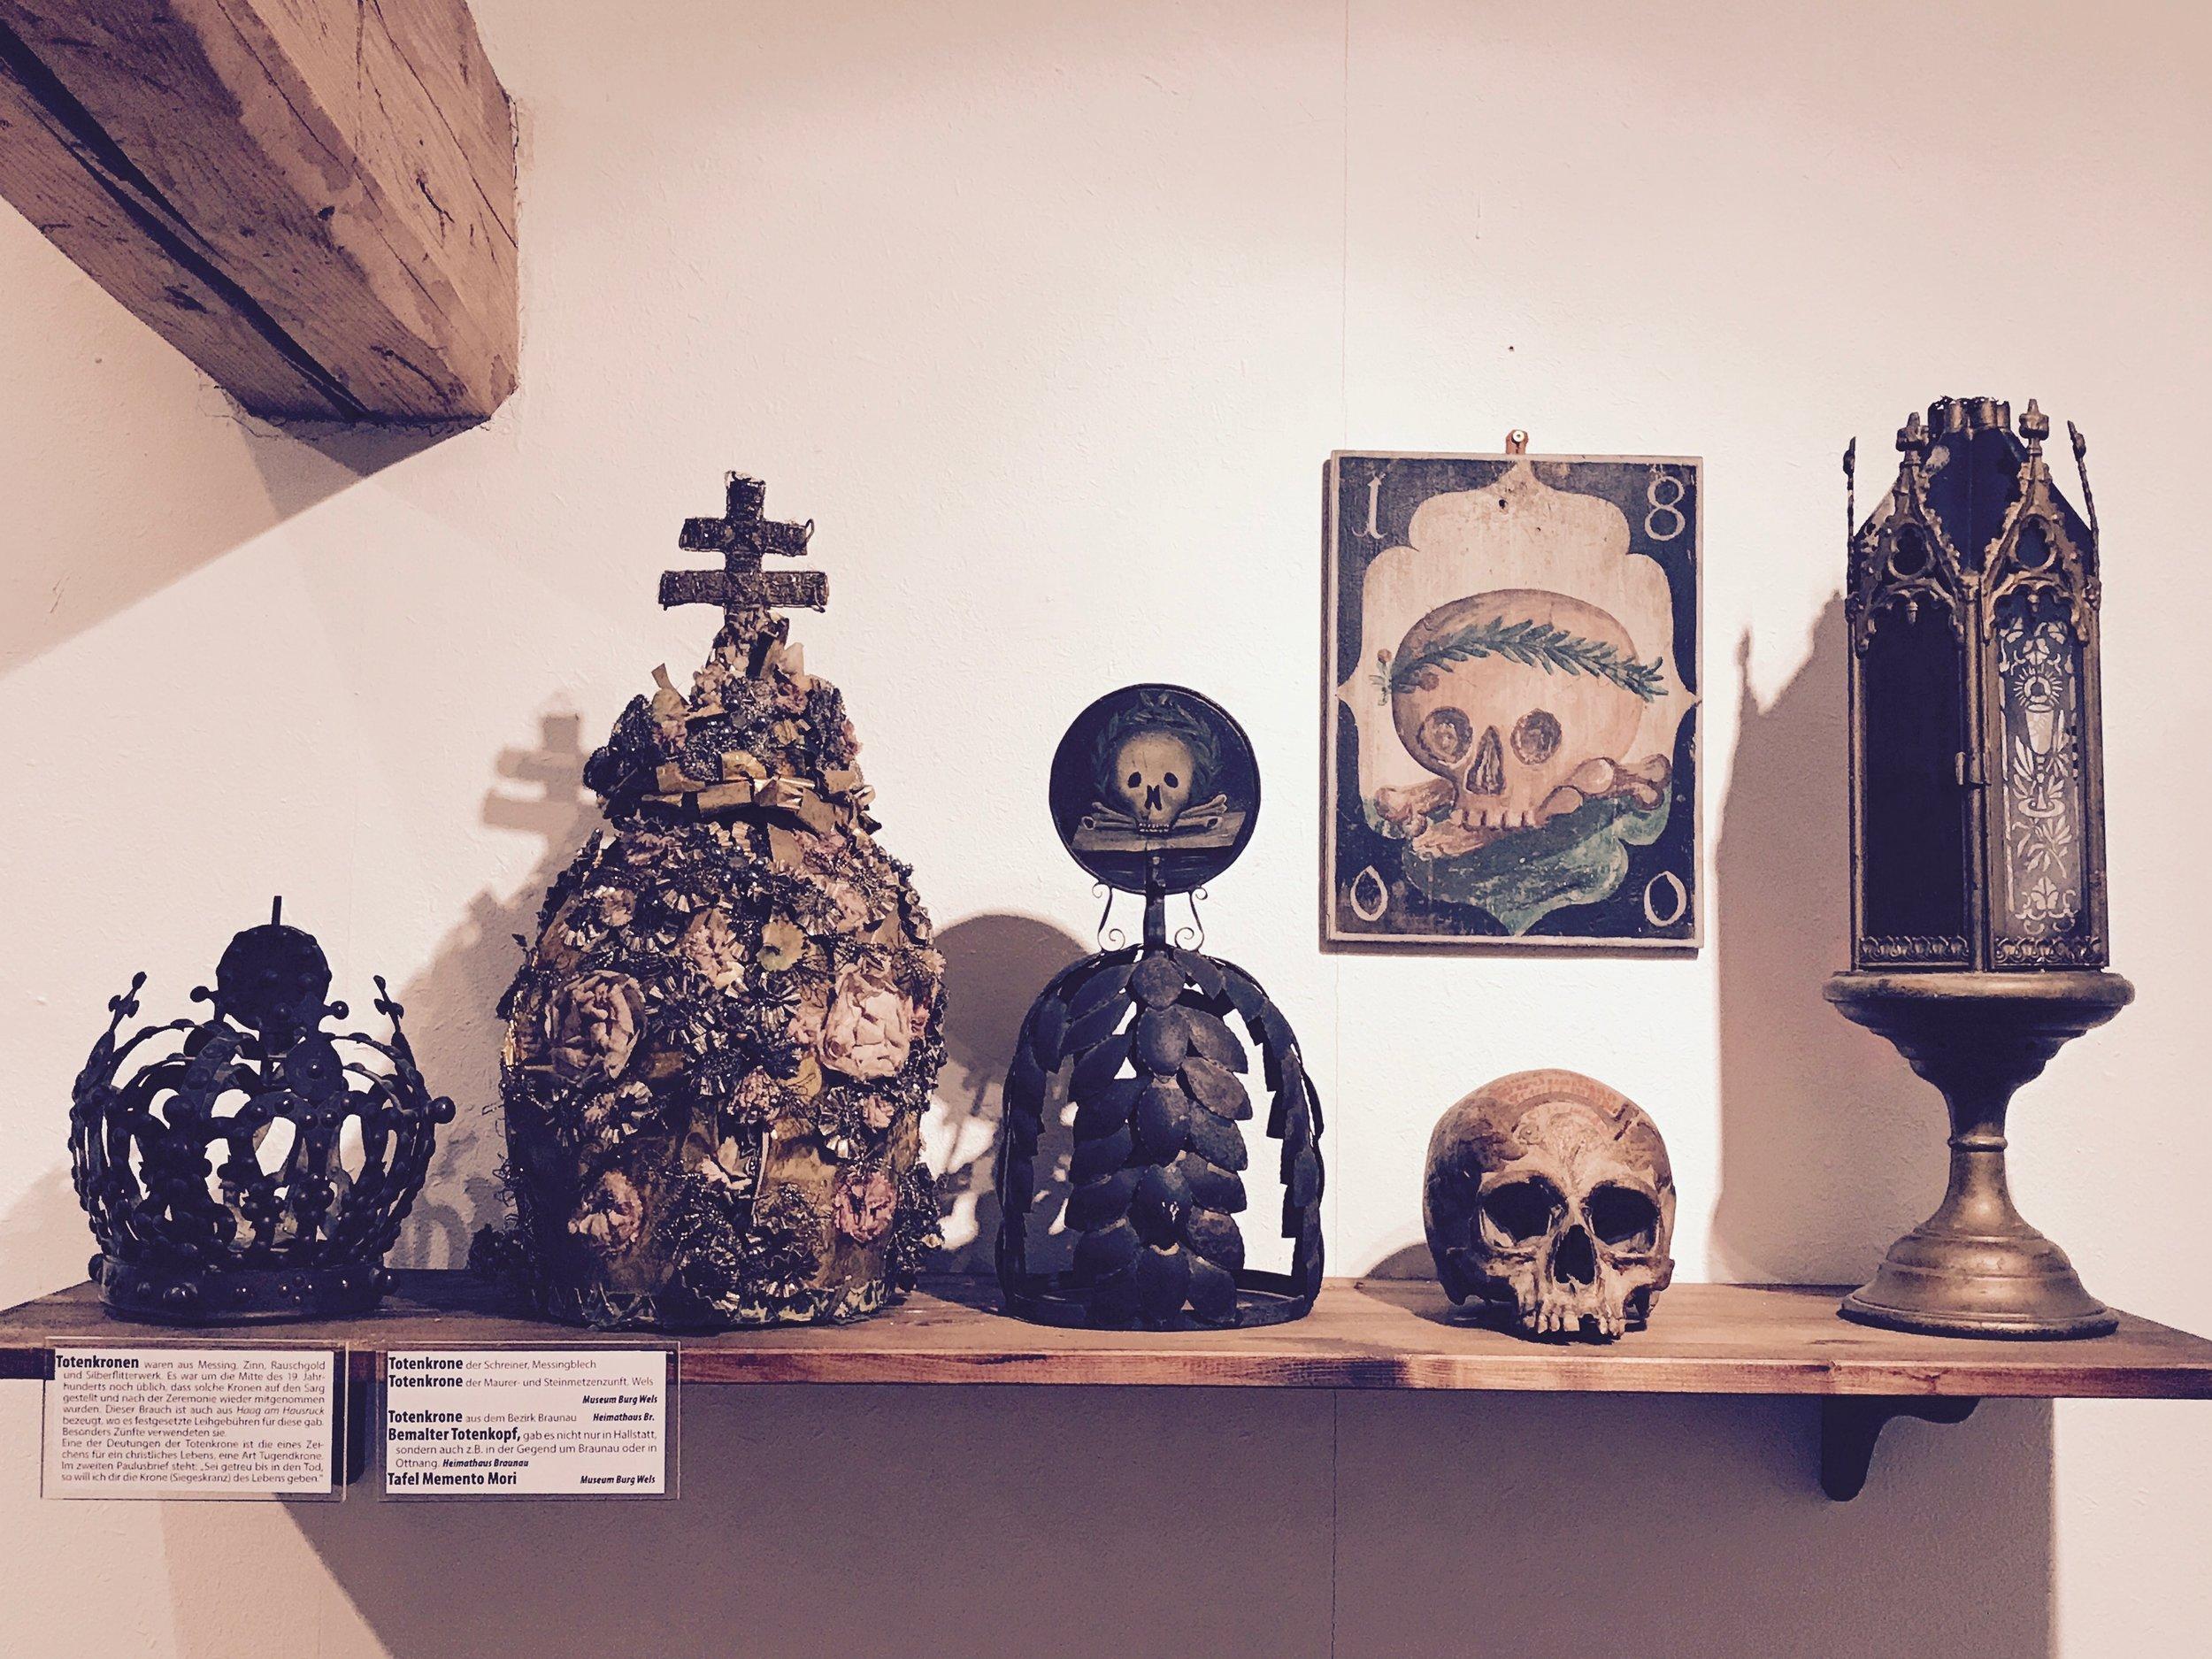 assorted folk-magical death paraphernalia